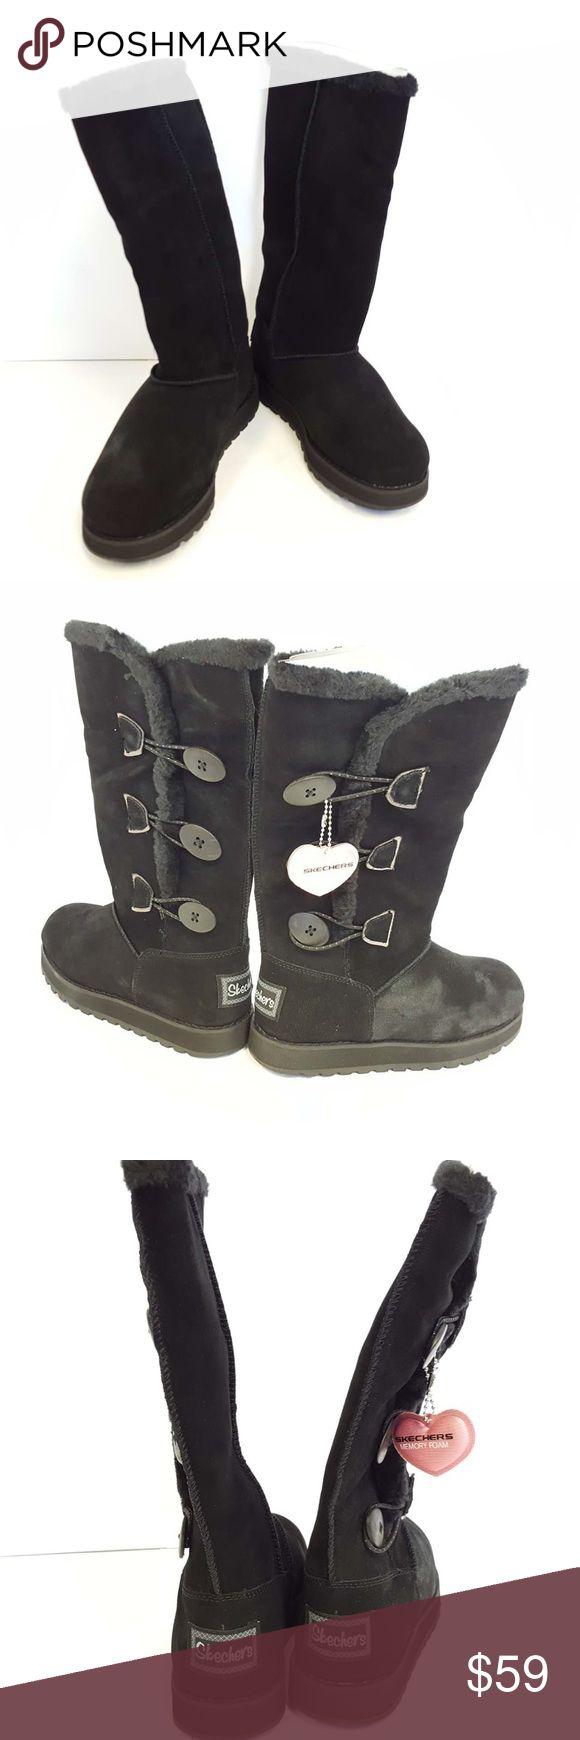 Sketcher's Boots brand new Brand new sketchers boots blk Skechers Shoes Winter & Rain Boots